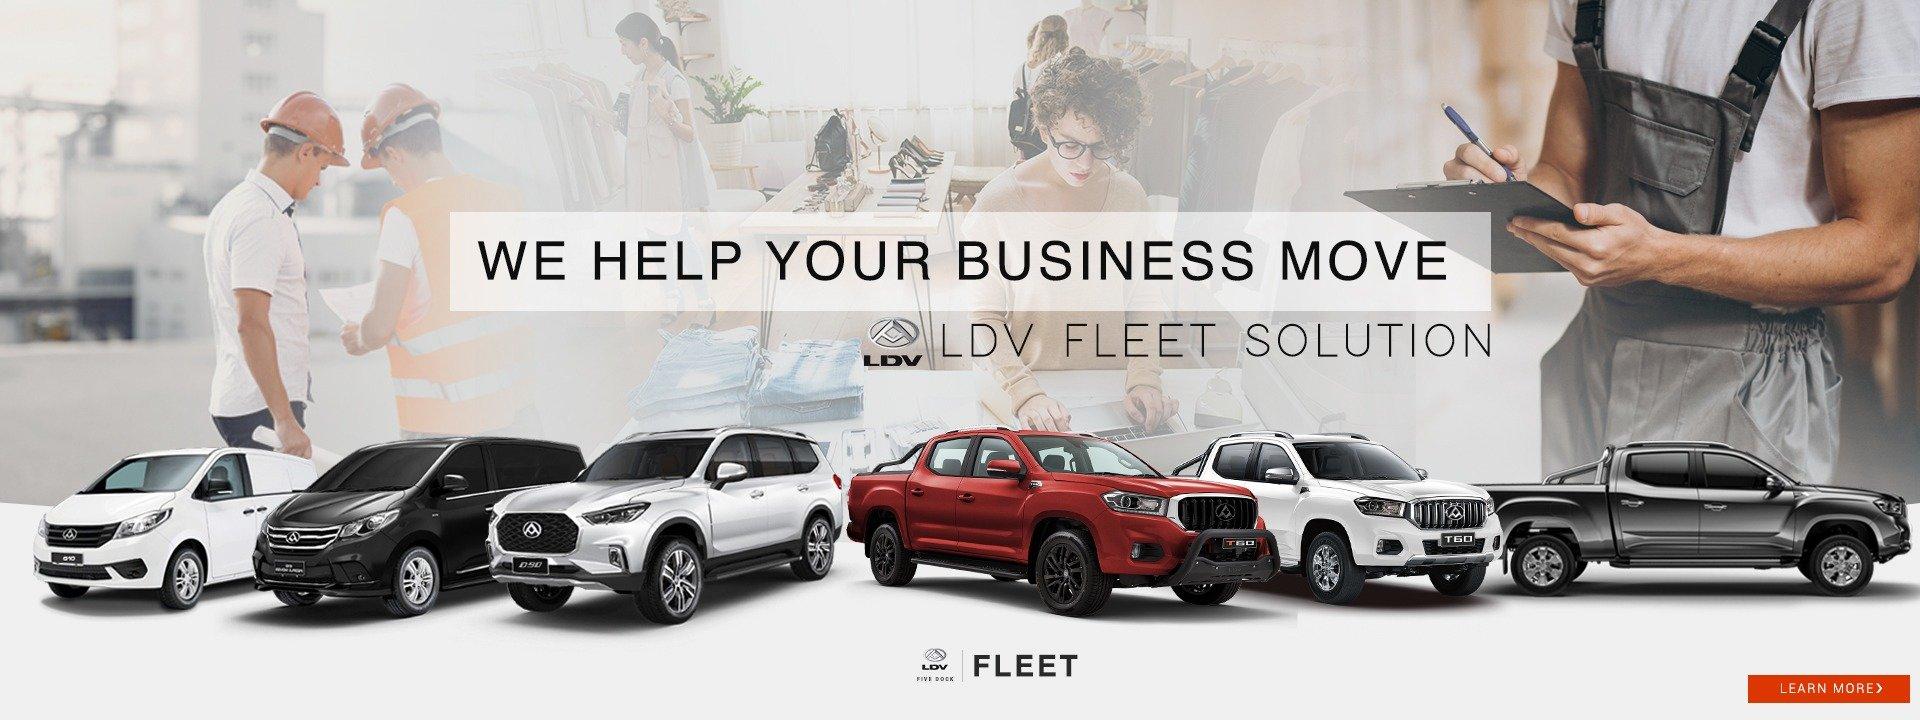 ldv_fleet